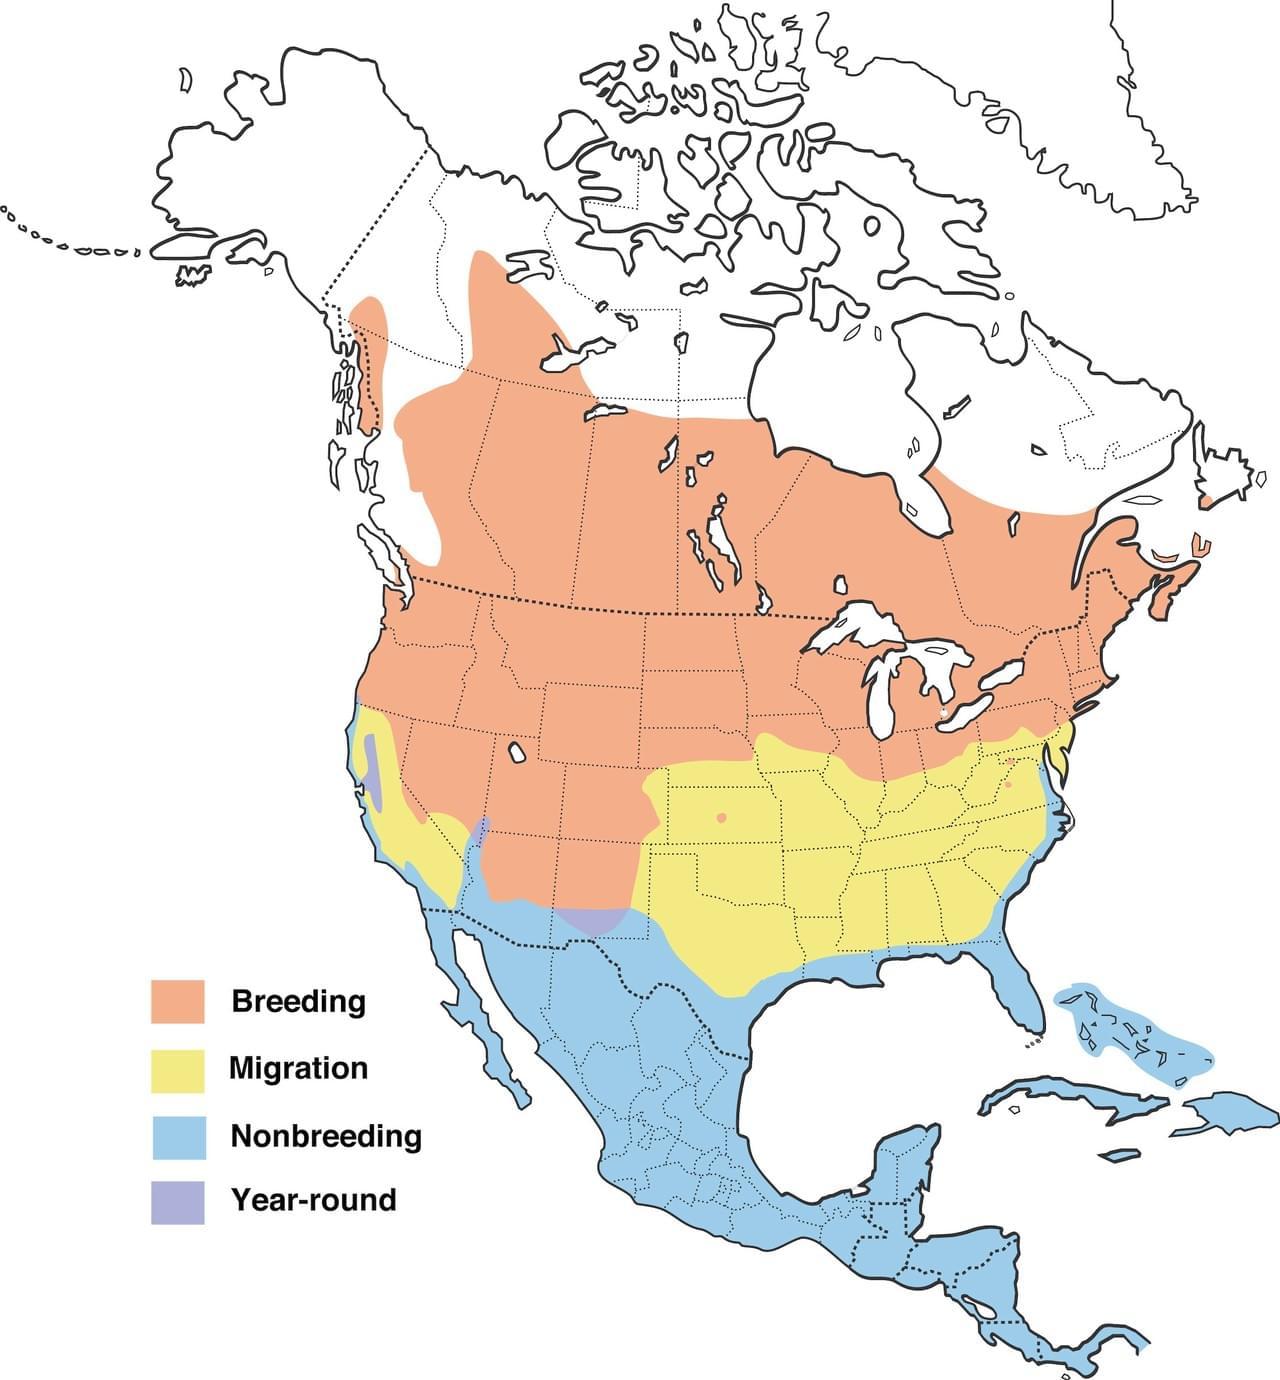 Range map provided by Cornell Lab of Ornithology